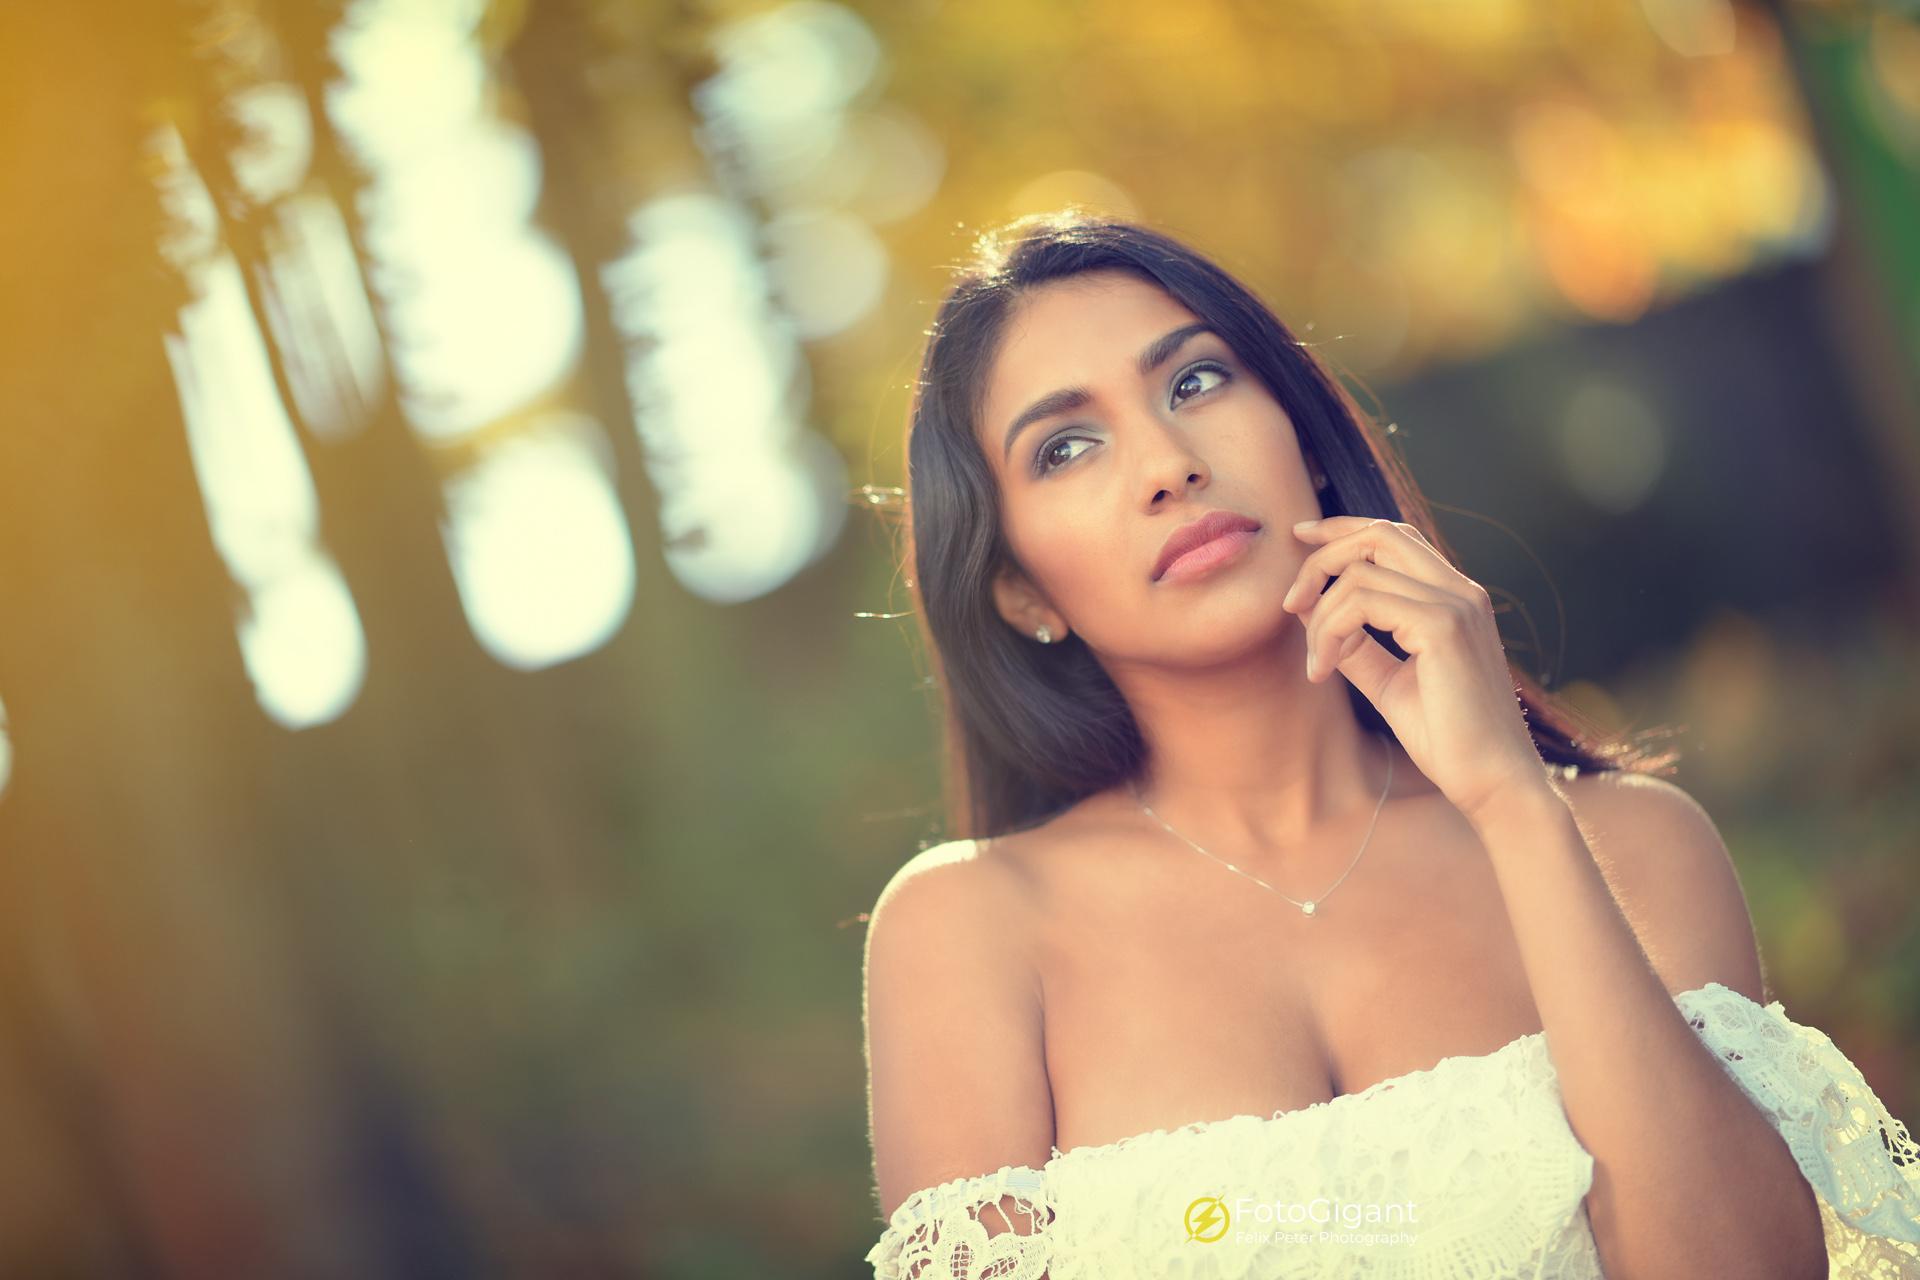 Beauty-und-Fantasy-Makeup_Bern_02.jpg